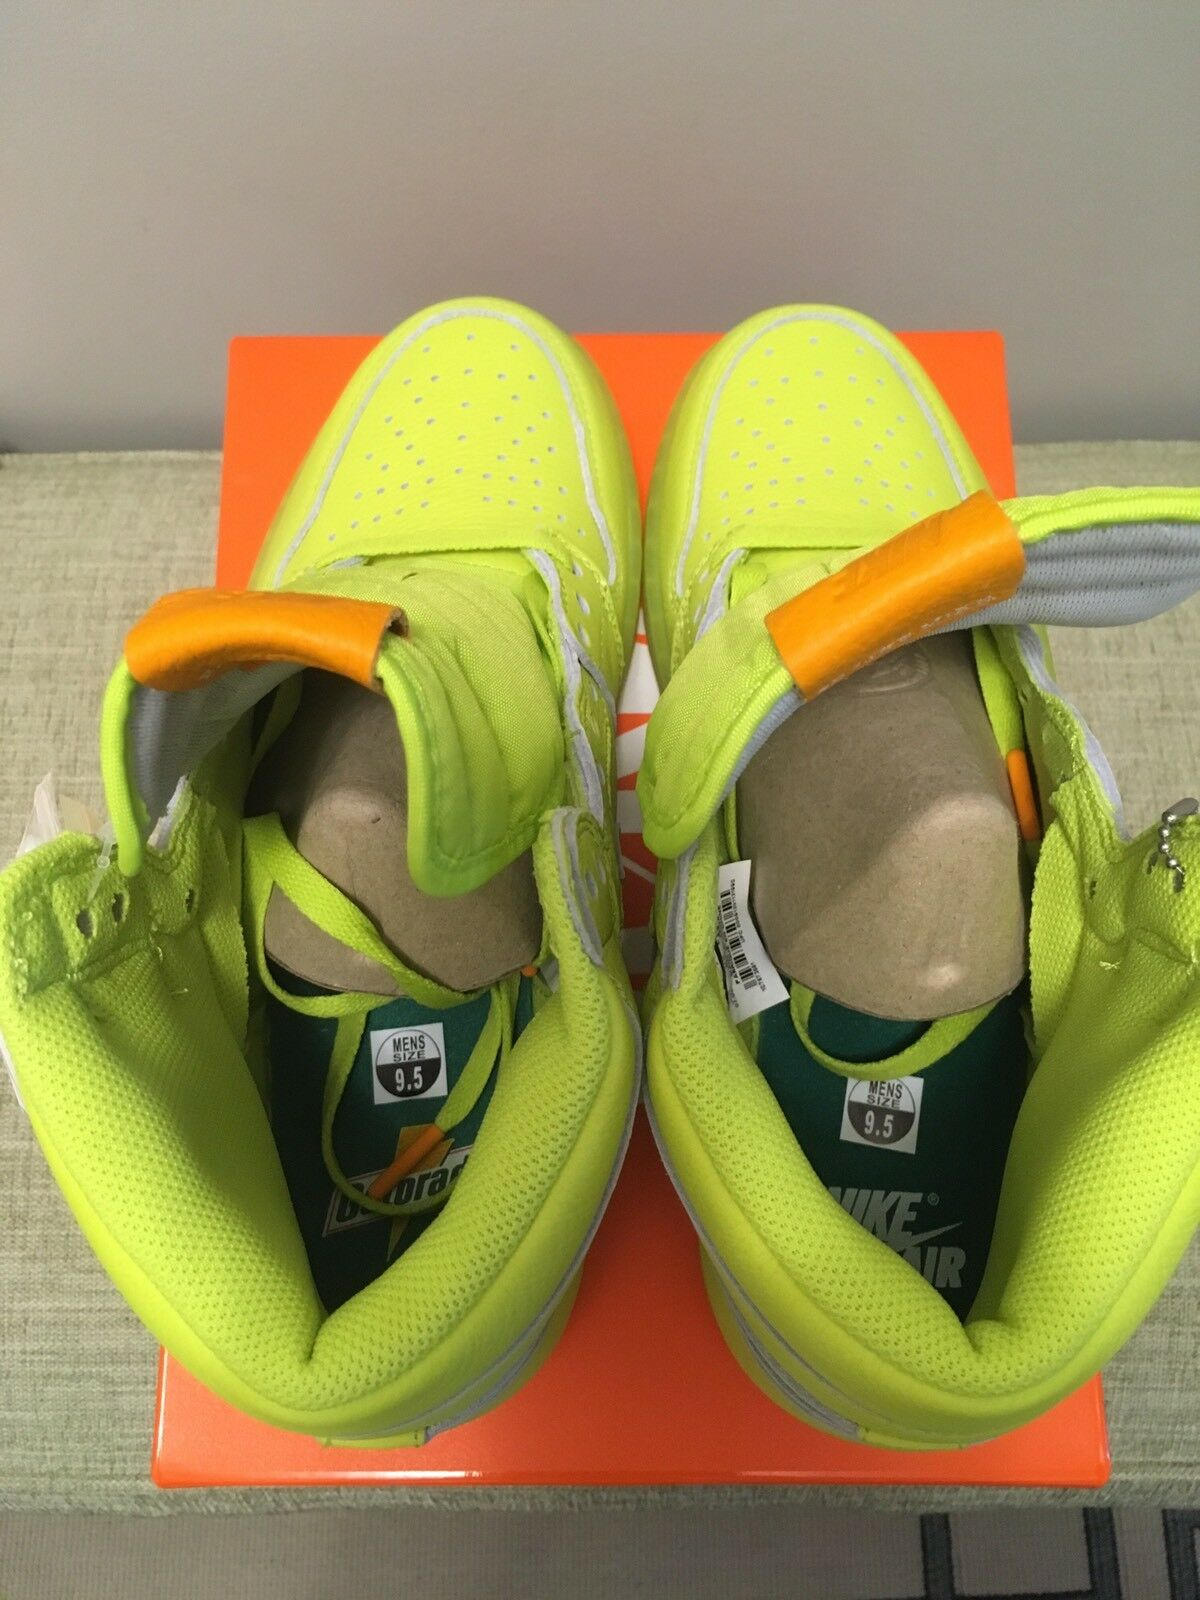 Nike Air Jirdan 1 Retro High OG